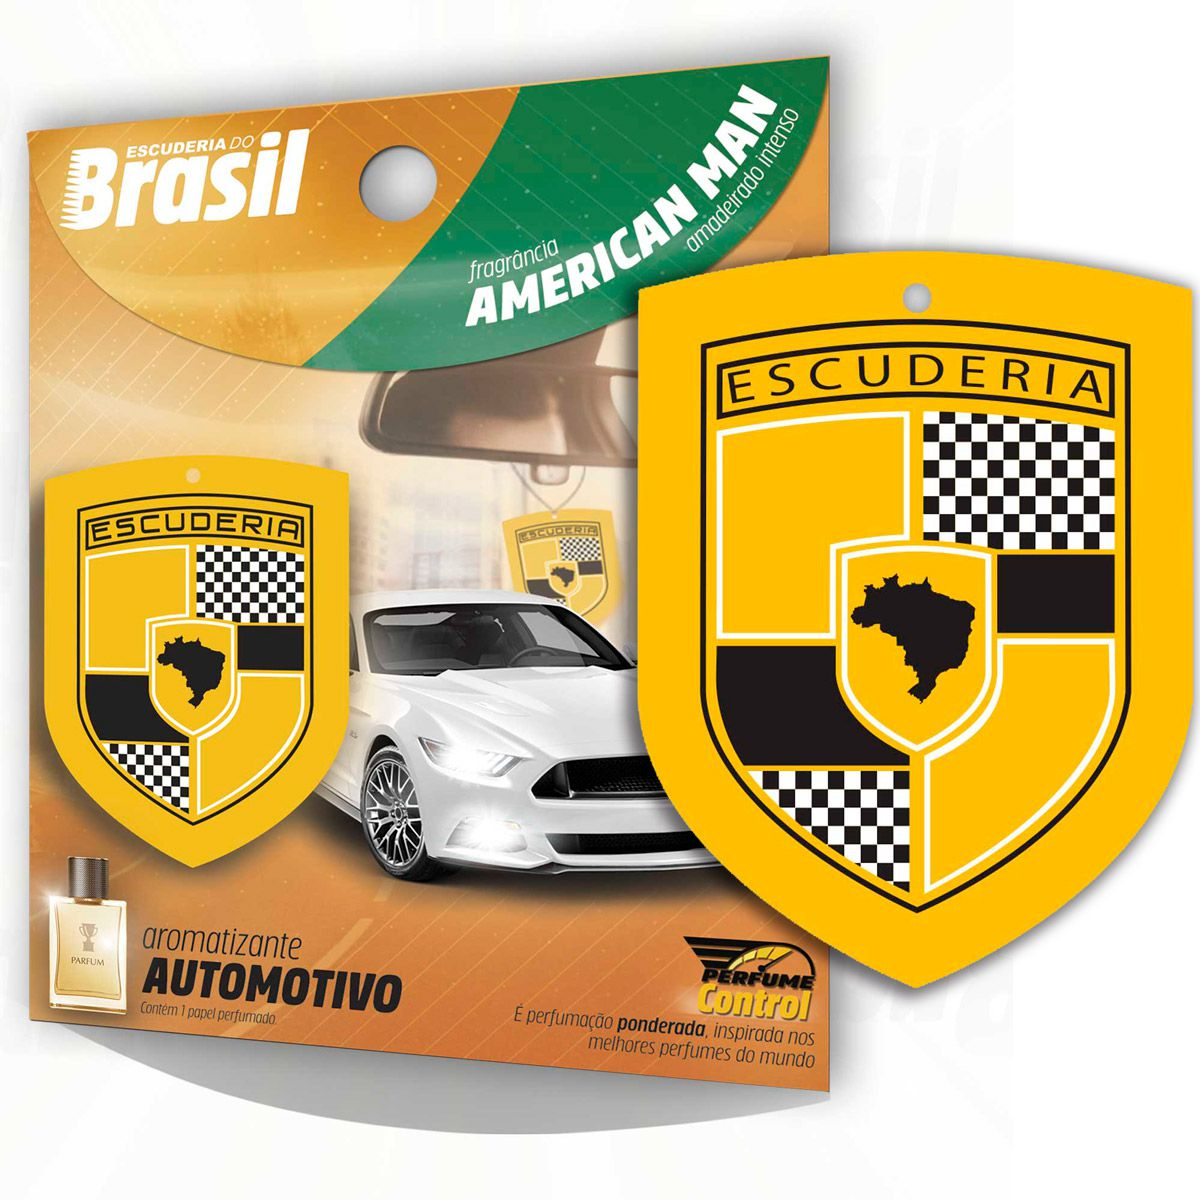 Aromatizante Automotivo Escuderia Brasil - Perfume American Man